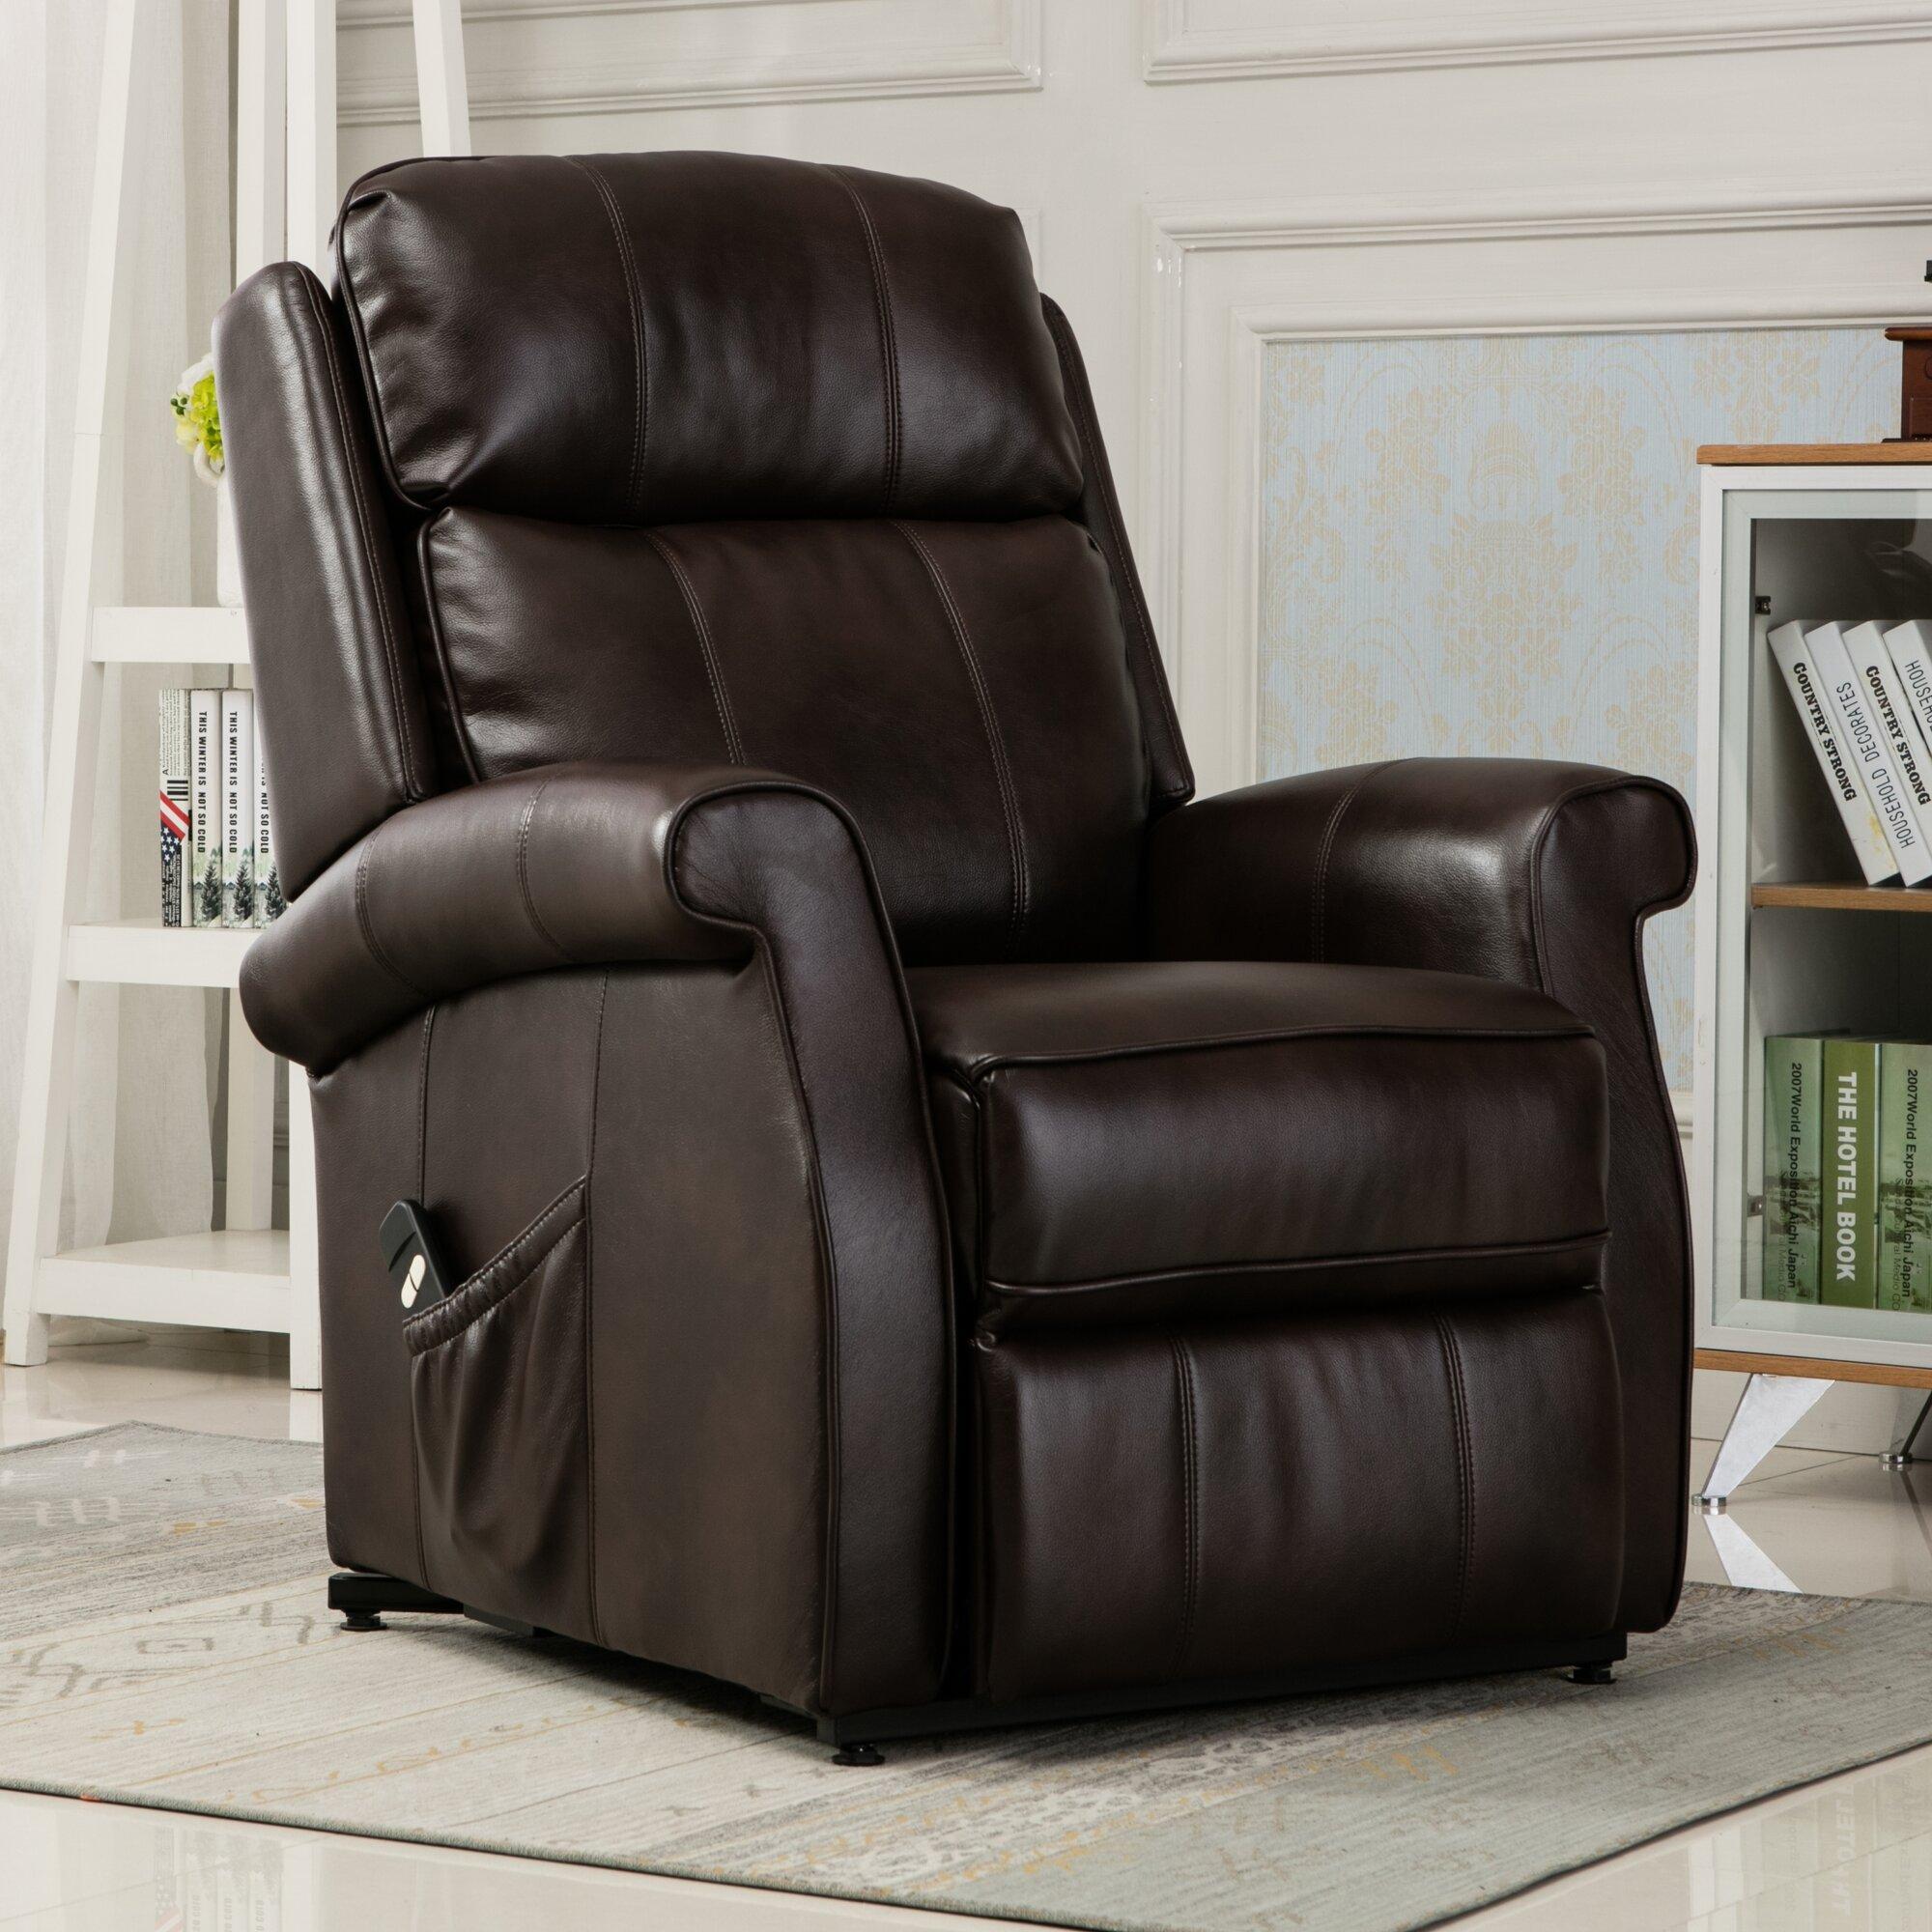 fy Chairs For Elderly thesecretconsul